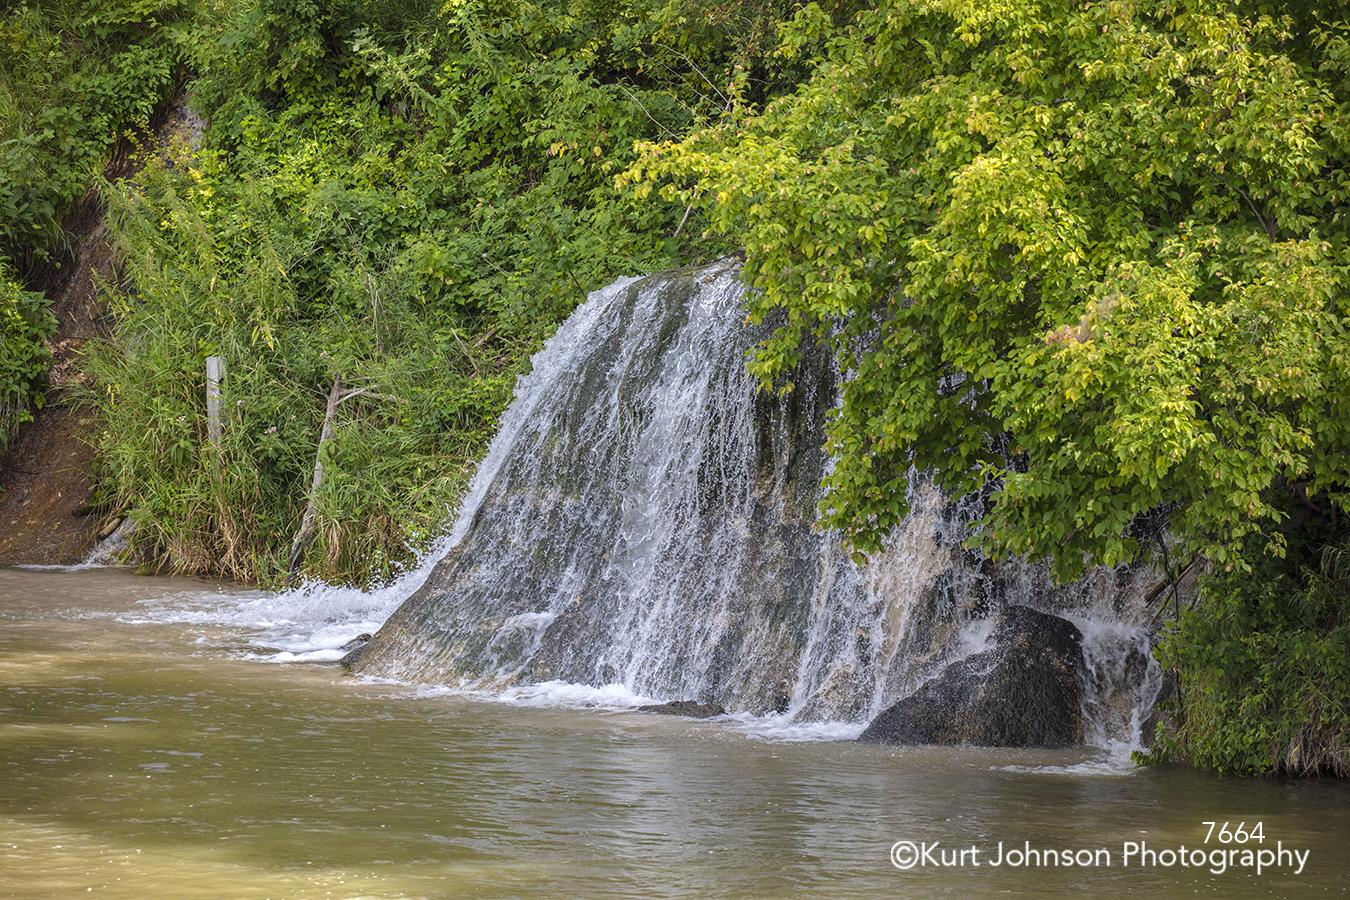 water waterfall green trees river forest waterscape landscape rocks